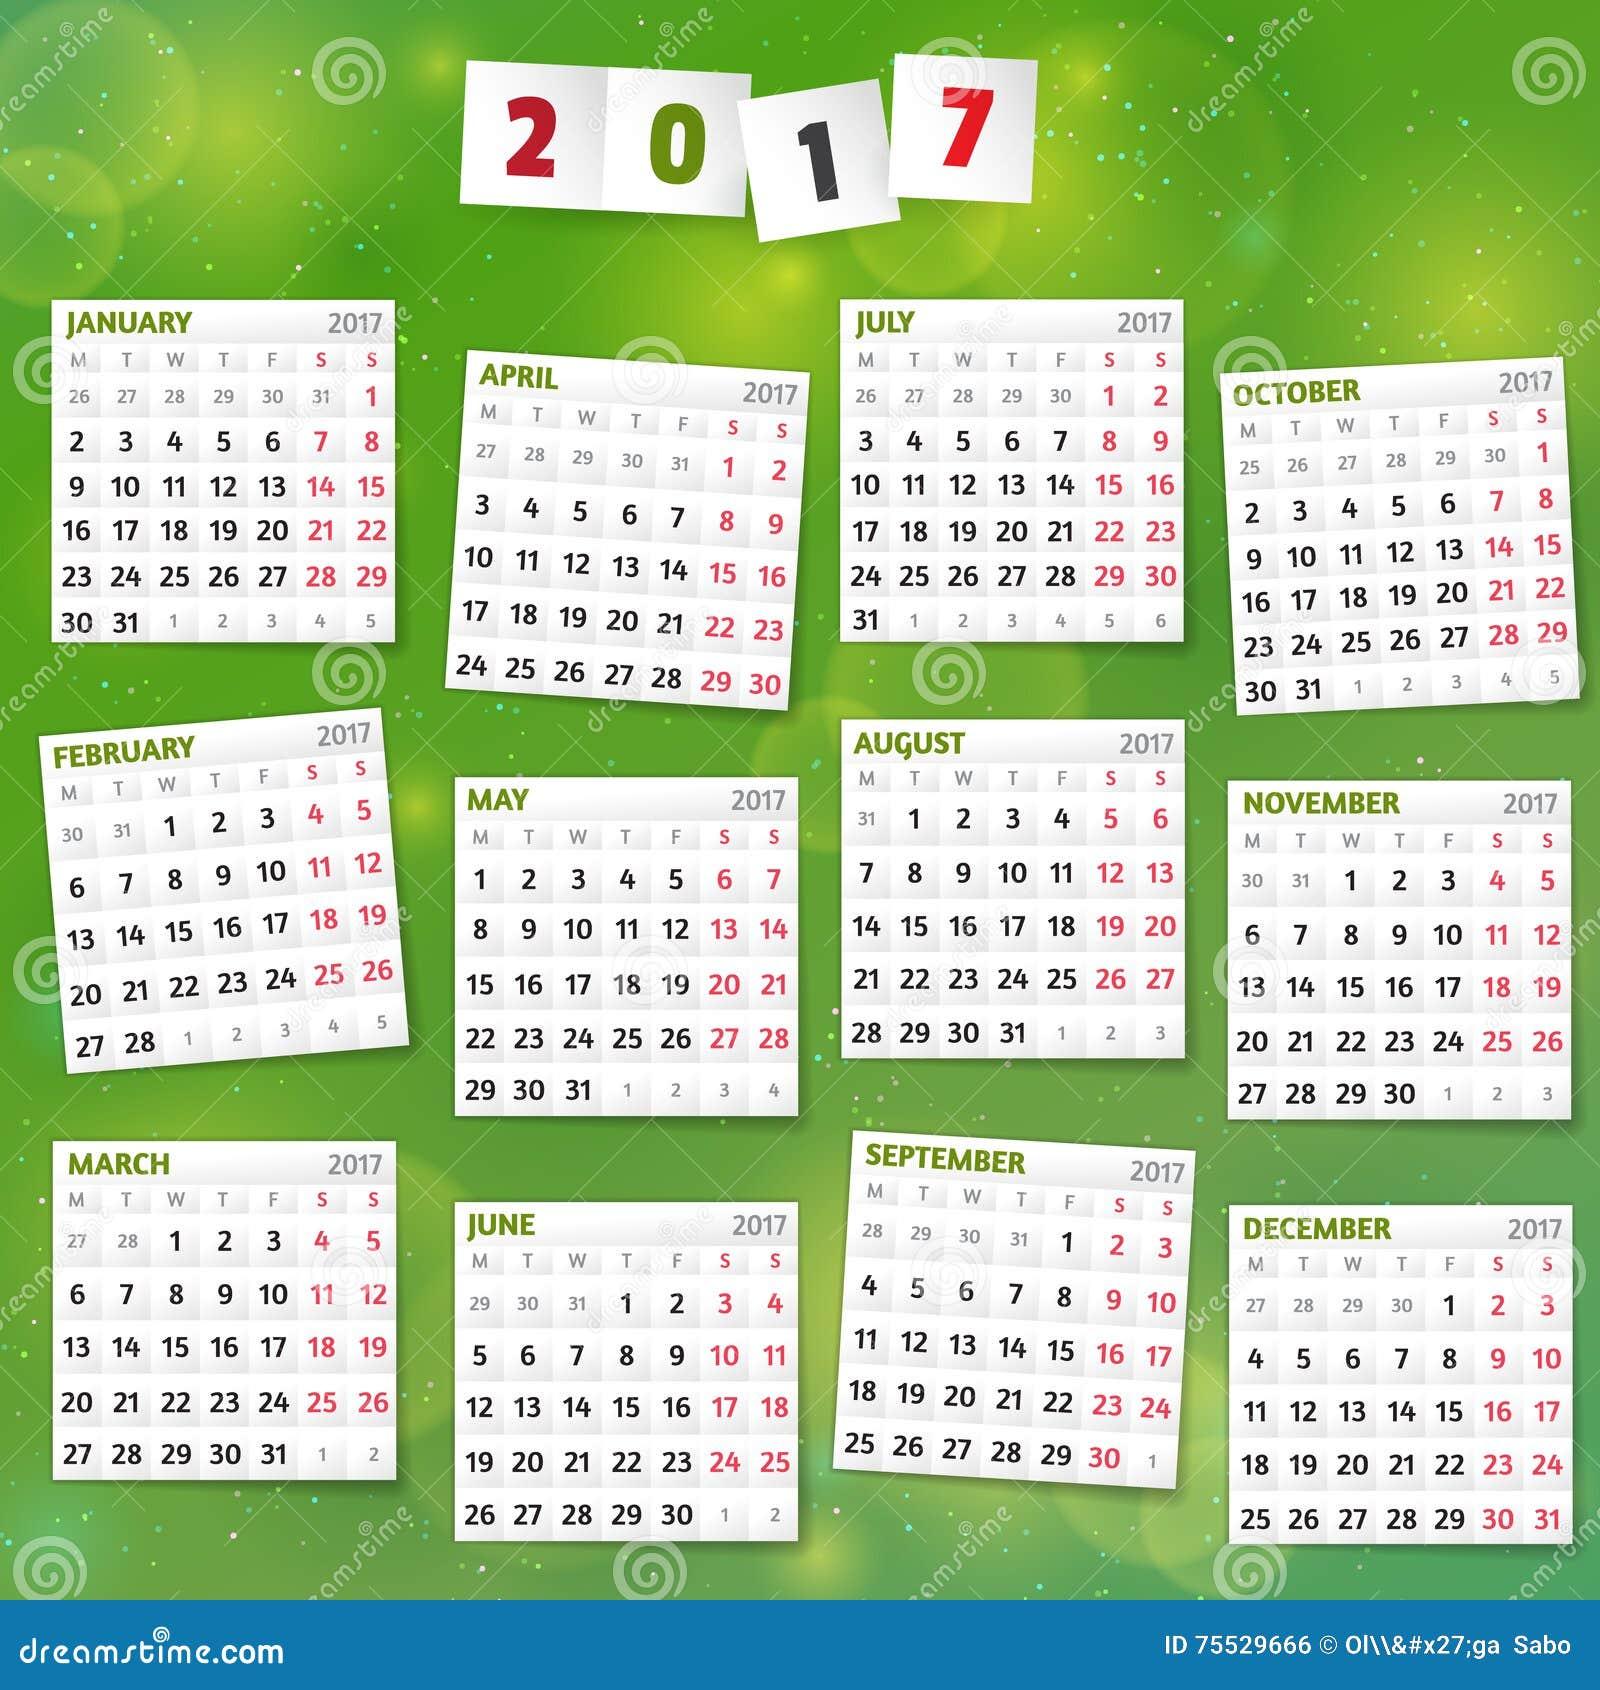 Calendar Green : Year calendar on joyful green background stock